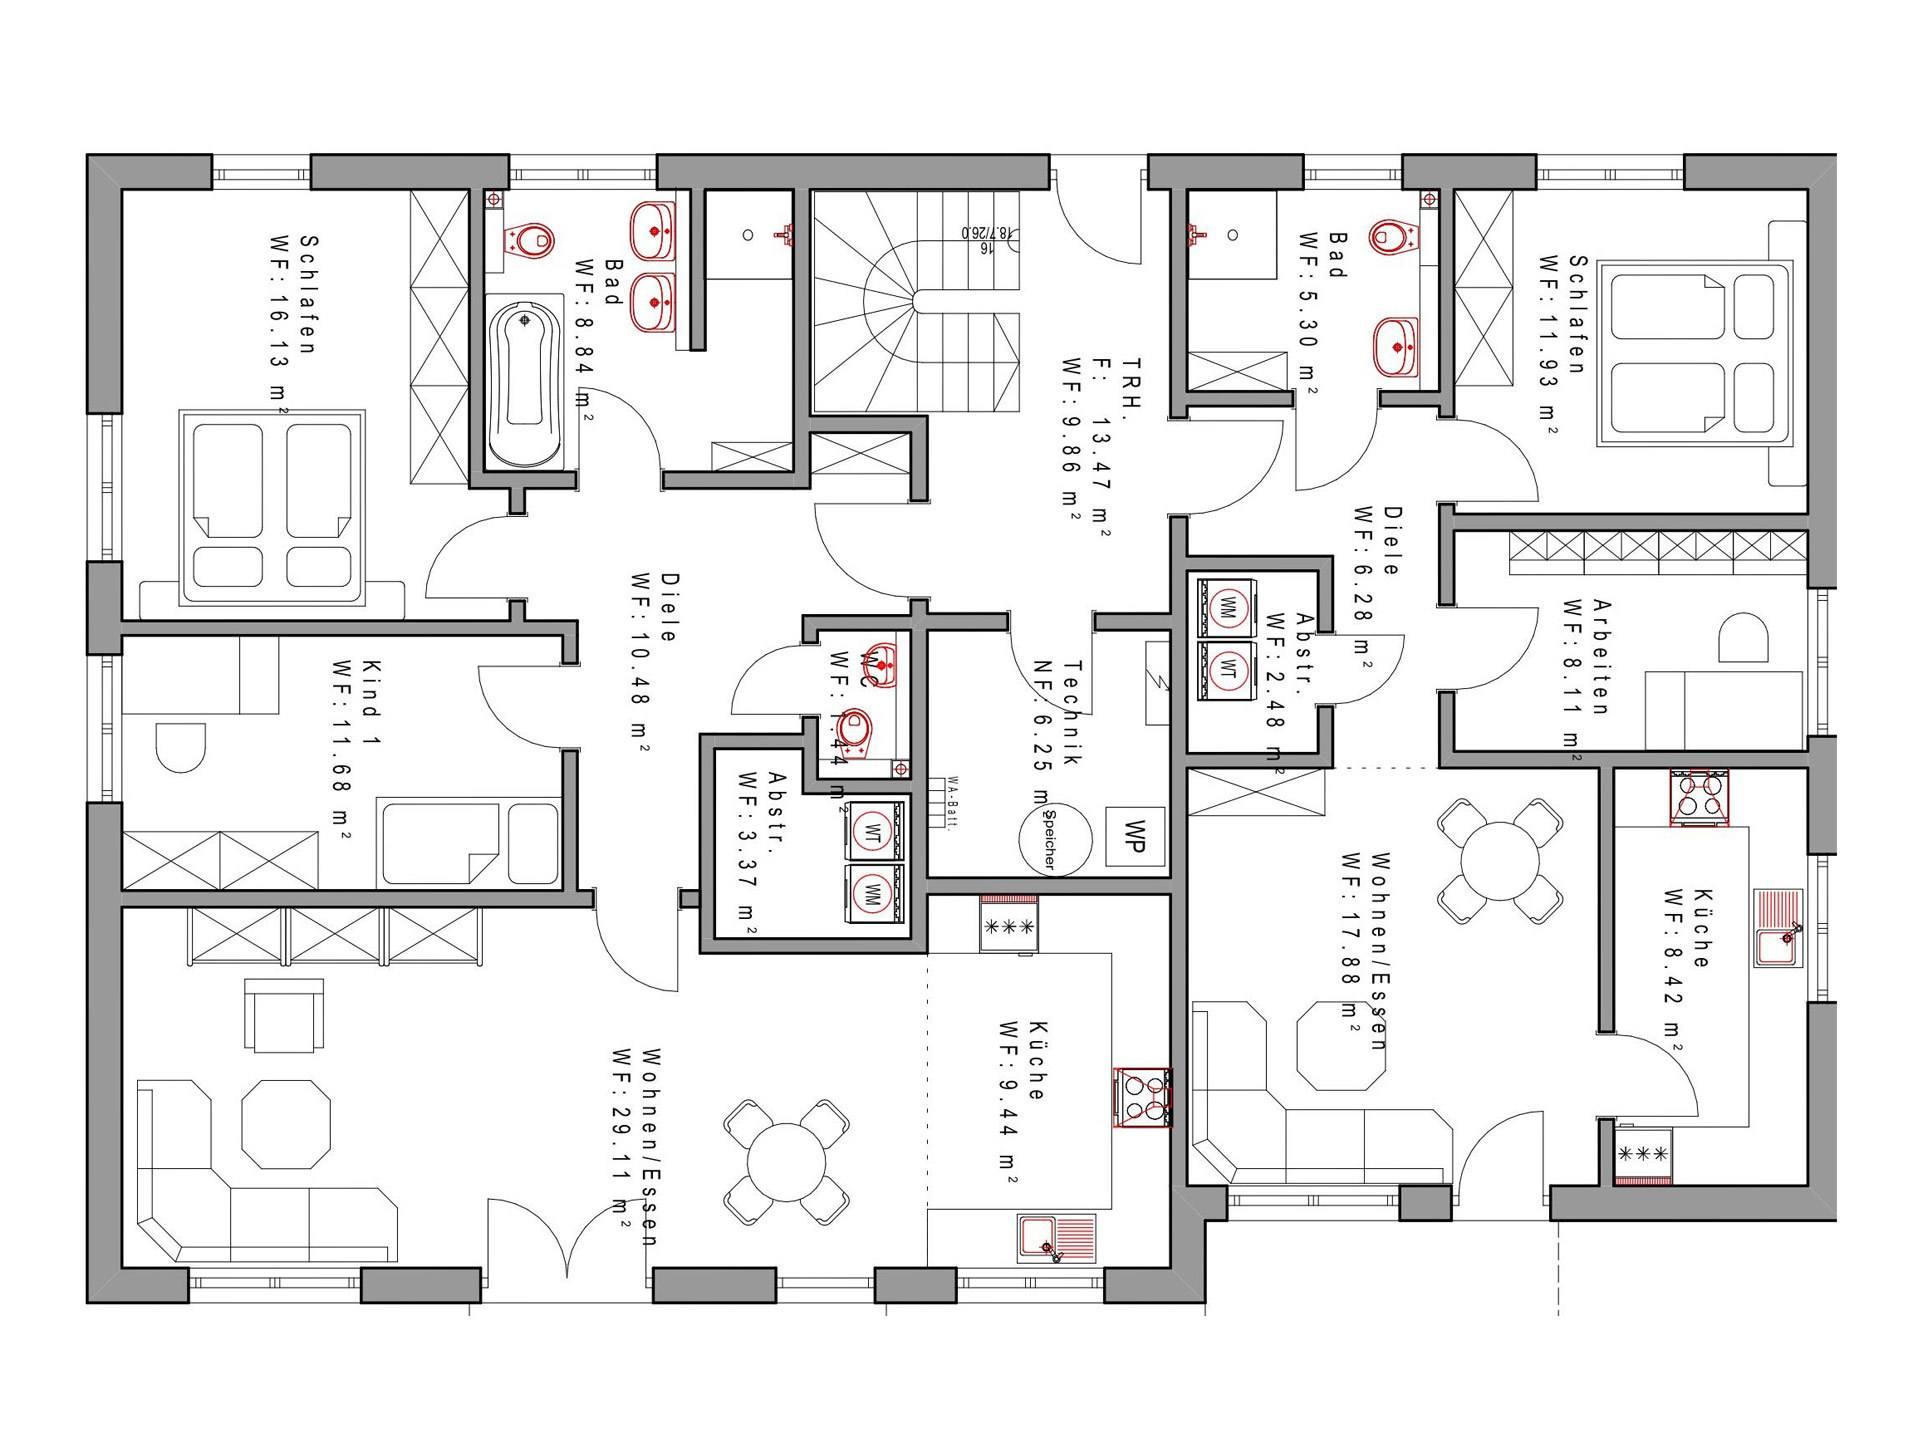 vierfamilienhaus sd338 sachsenheimer fertighaus. Black Bedroom Furniture Sets. Home Design Ideas